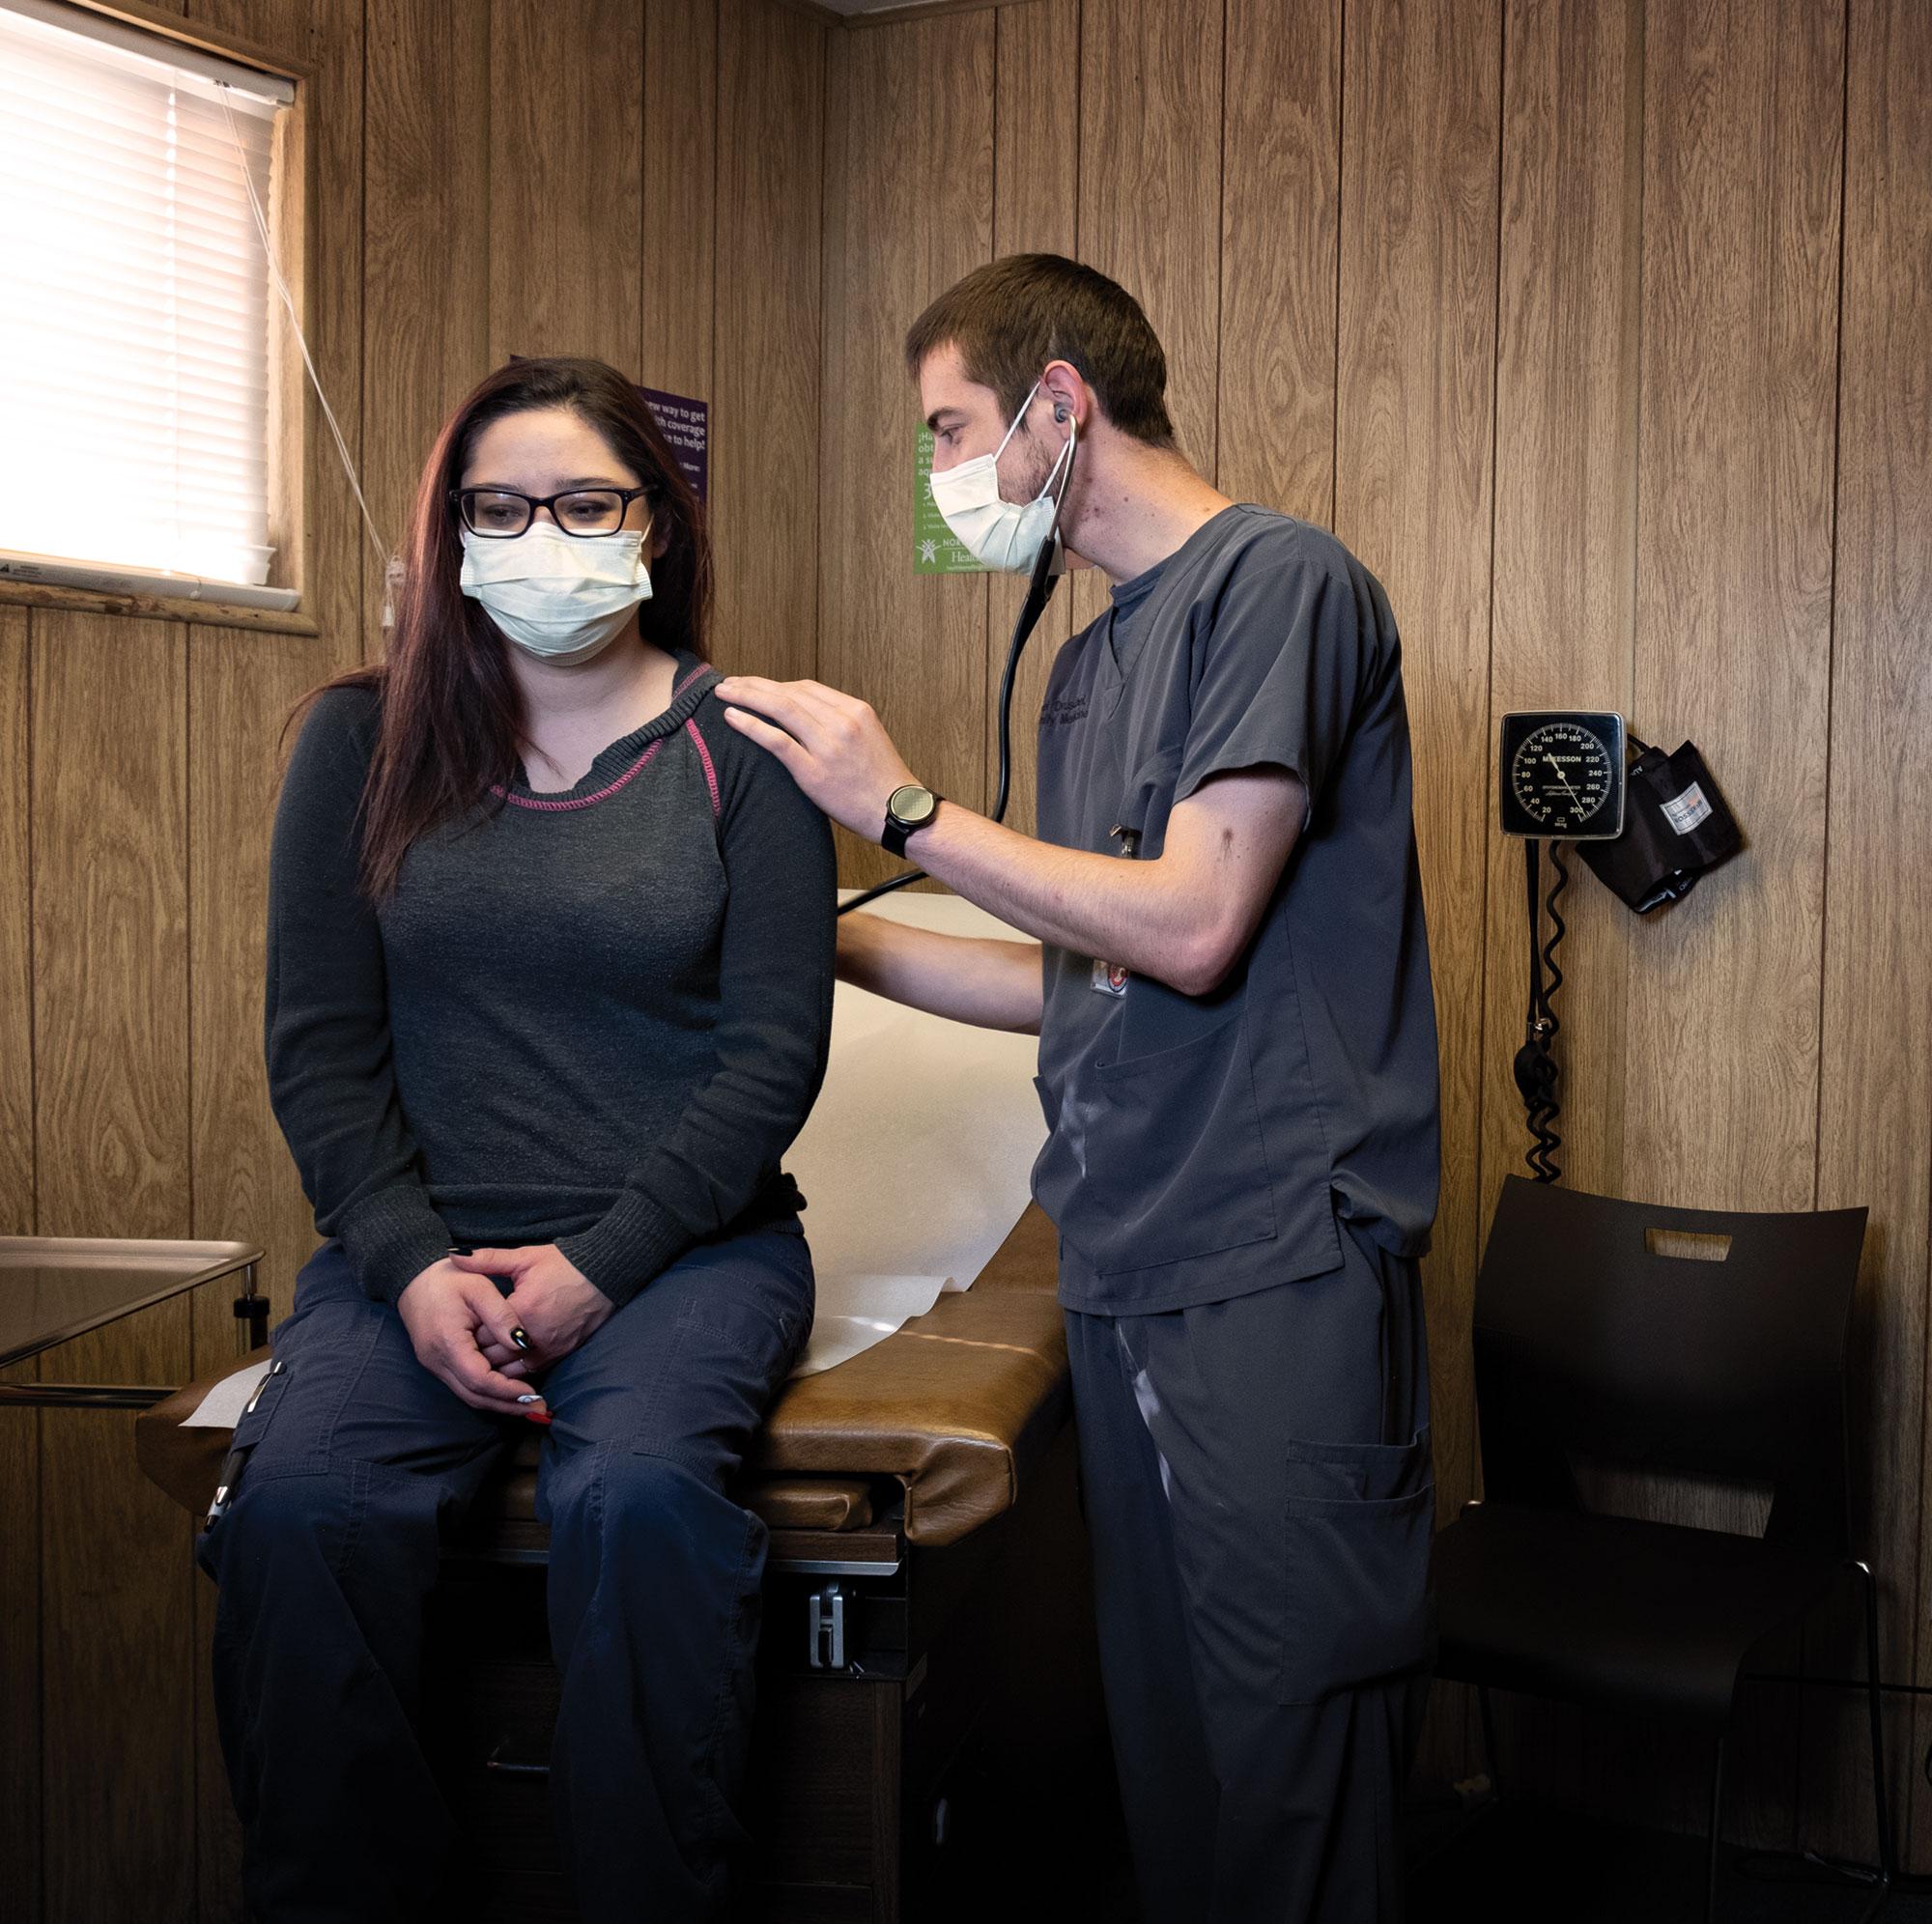 Dr. Druschel examines a patient in his Seligman practice; Photo by Mirelle Inglefield